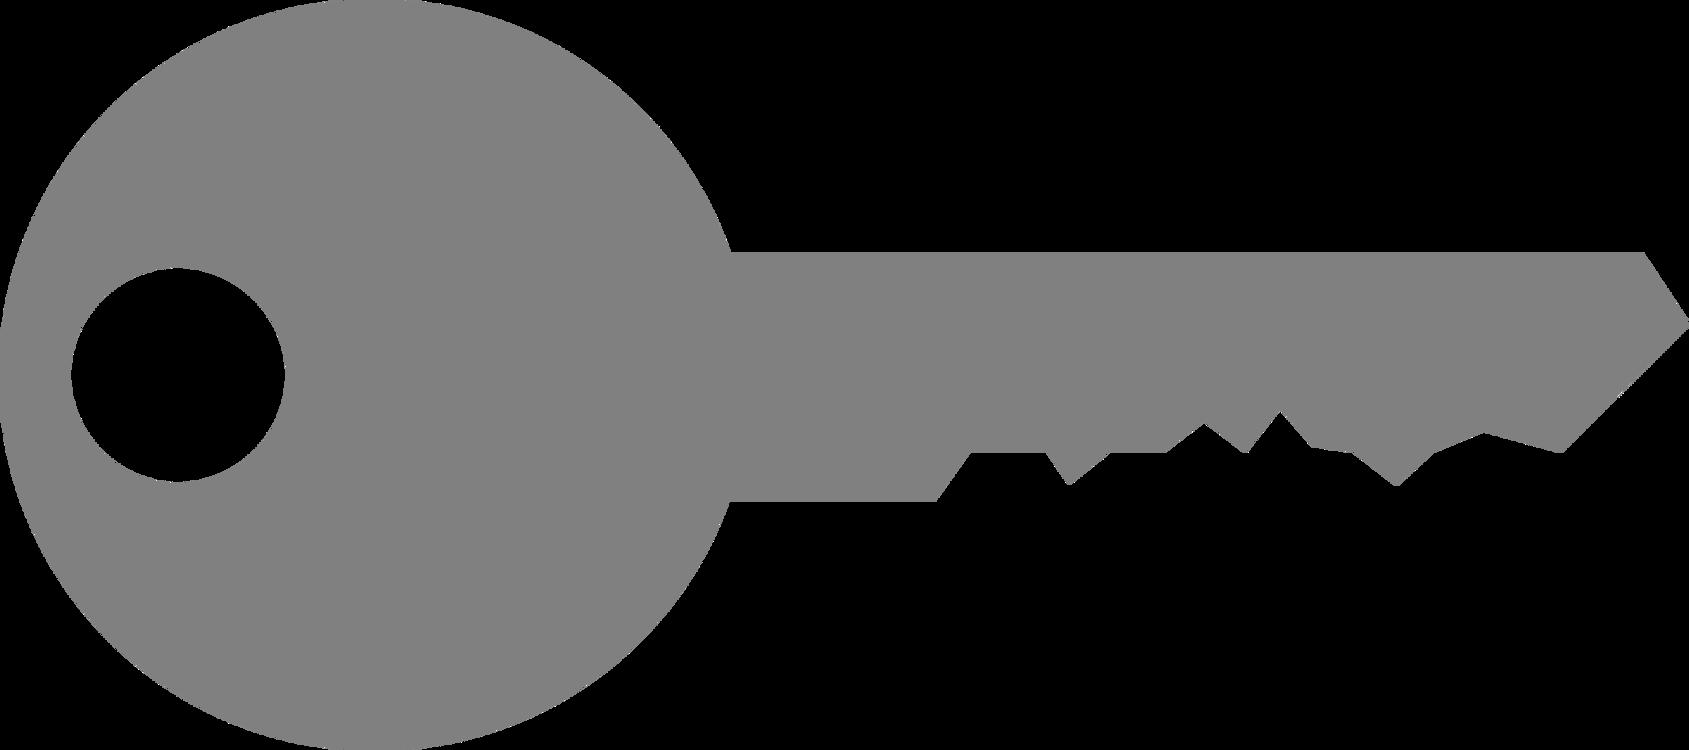 Angle,Hardware Accessory,Line